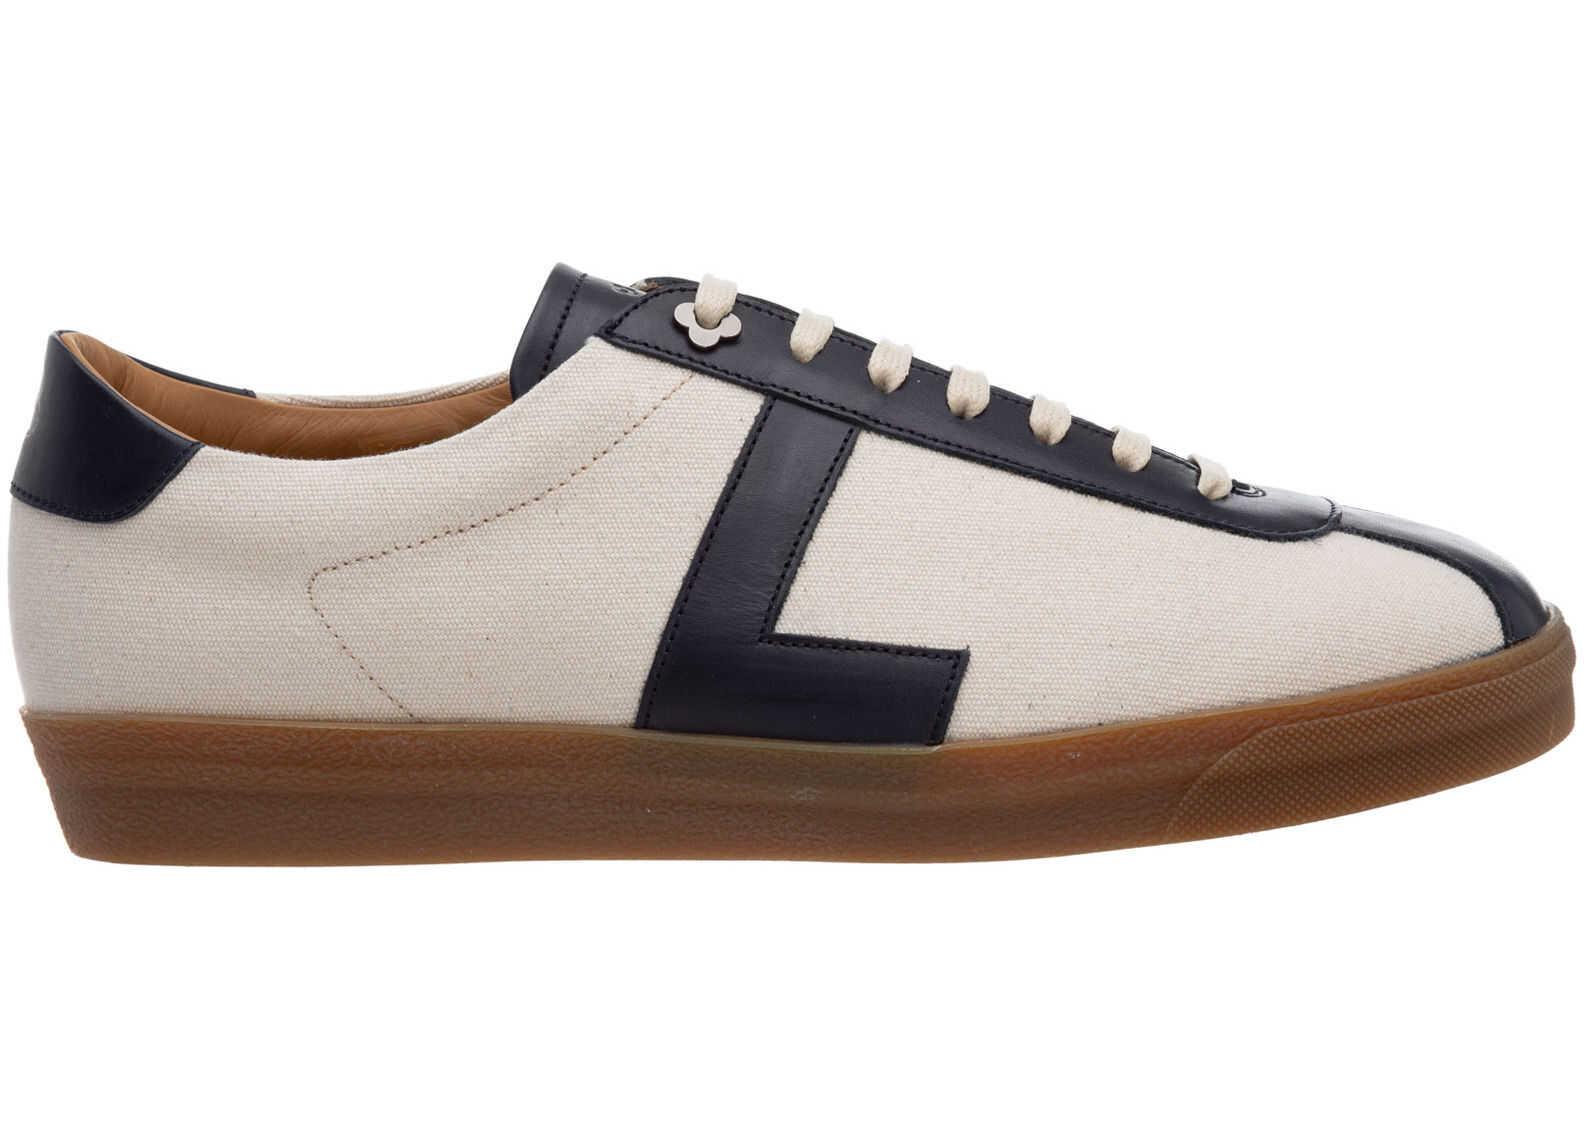 Lardini Trainers Sneakers ELBASQUIAT_EL56340A_850BE Blue imagine b-mall.ro